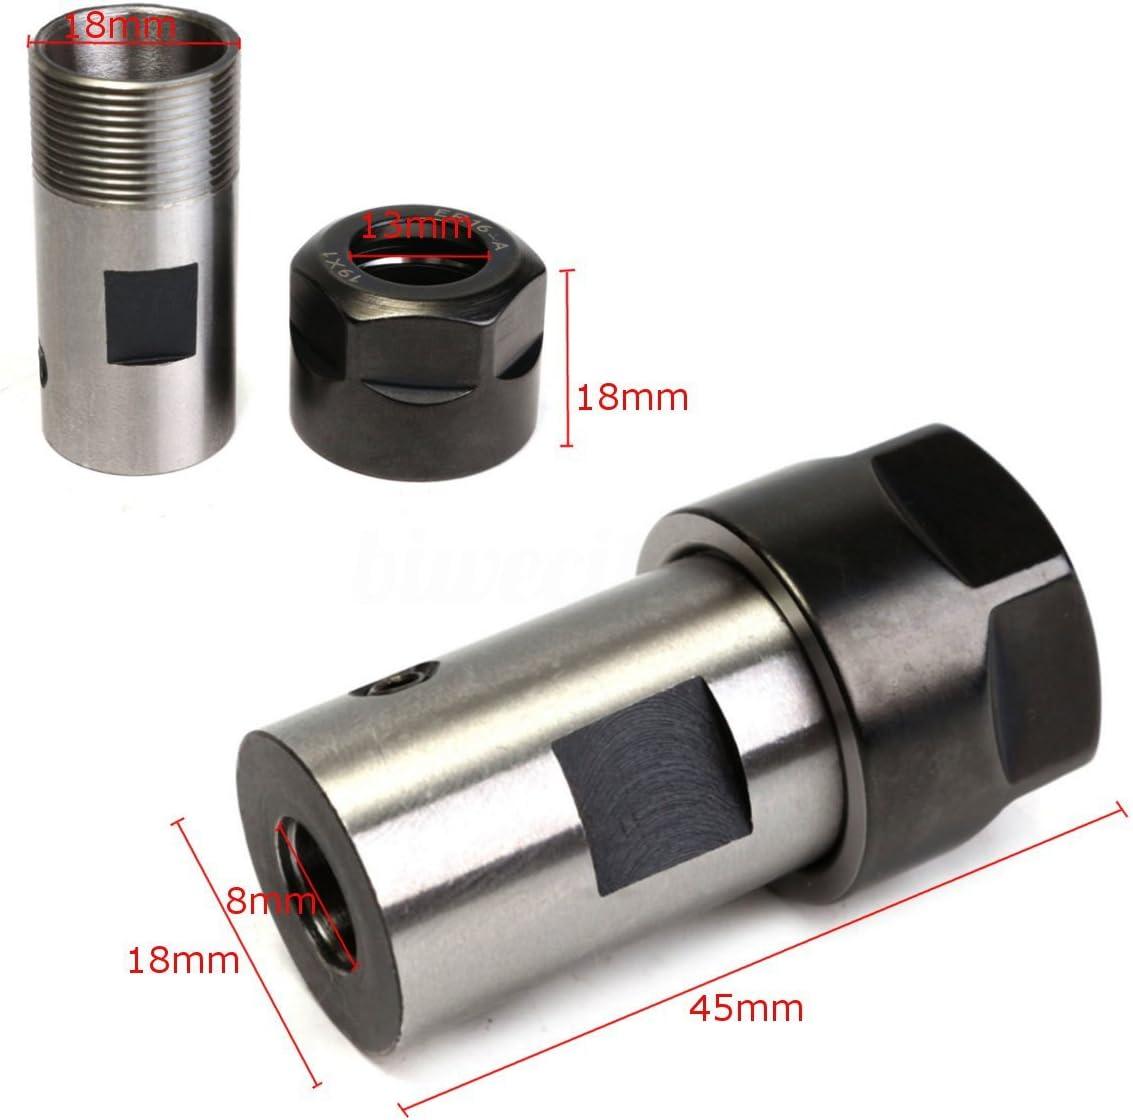 Espeedy ER16 Collet Chuck Motor Shaft Inner 8mm Spindle Extension Rod for CNC Milling